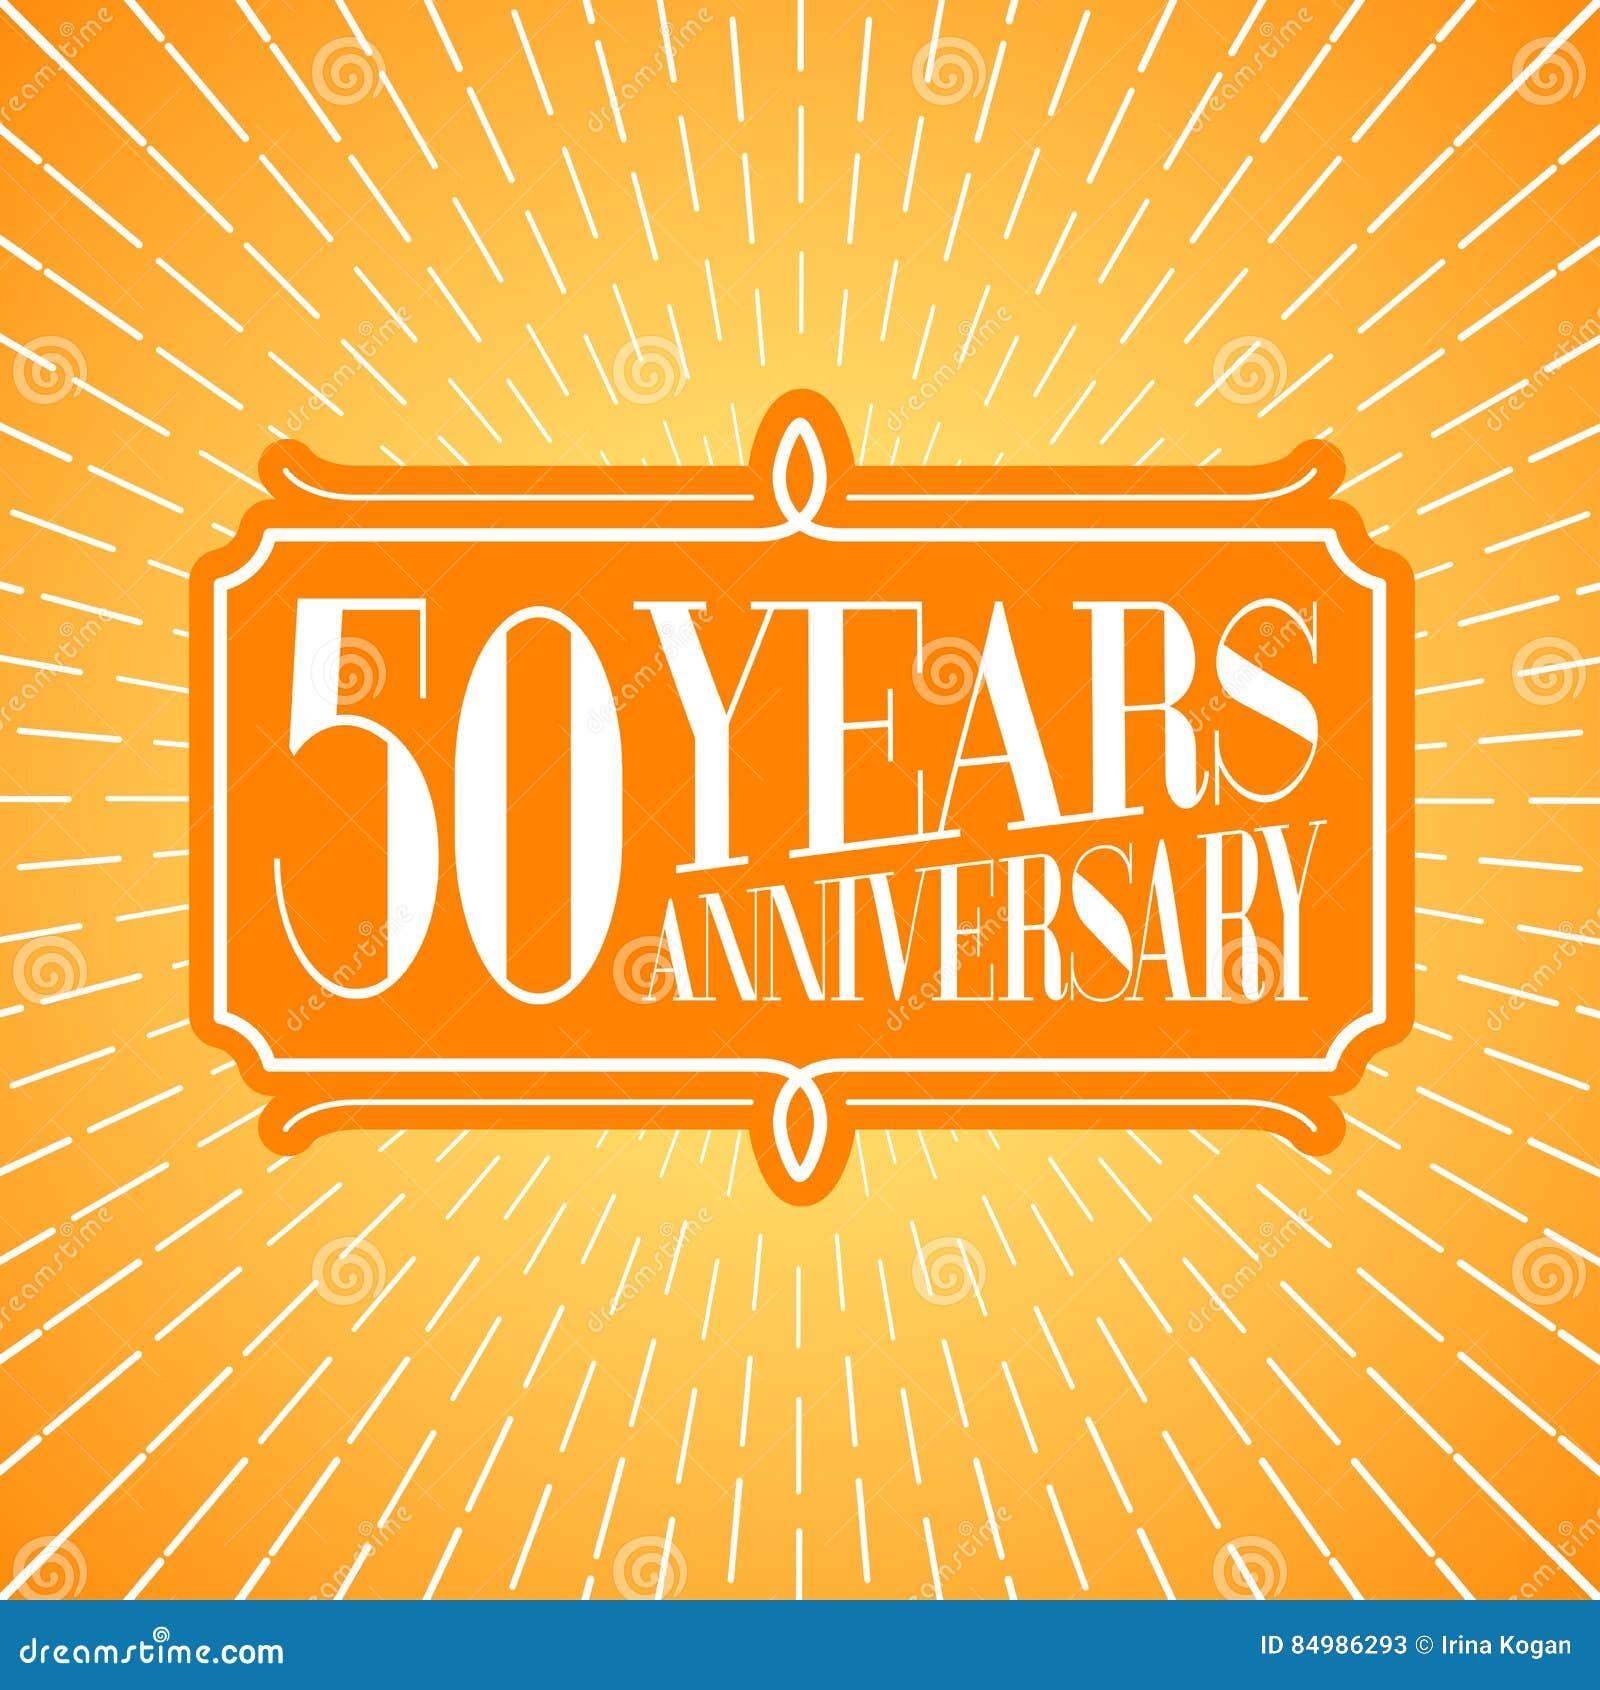 50 Years Anniversary Vector Icon Logo